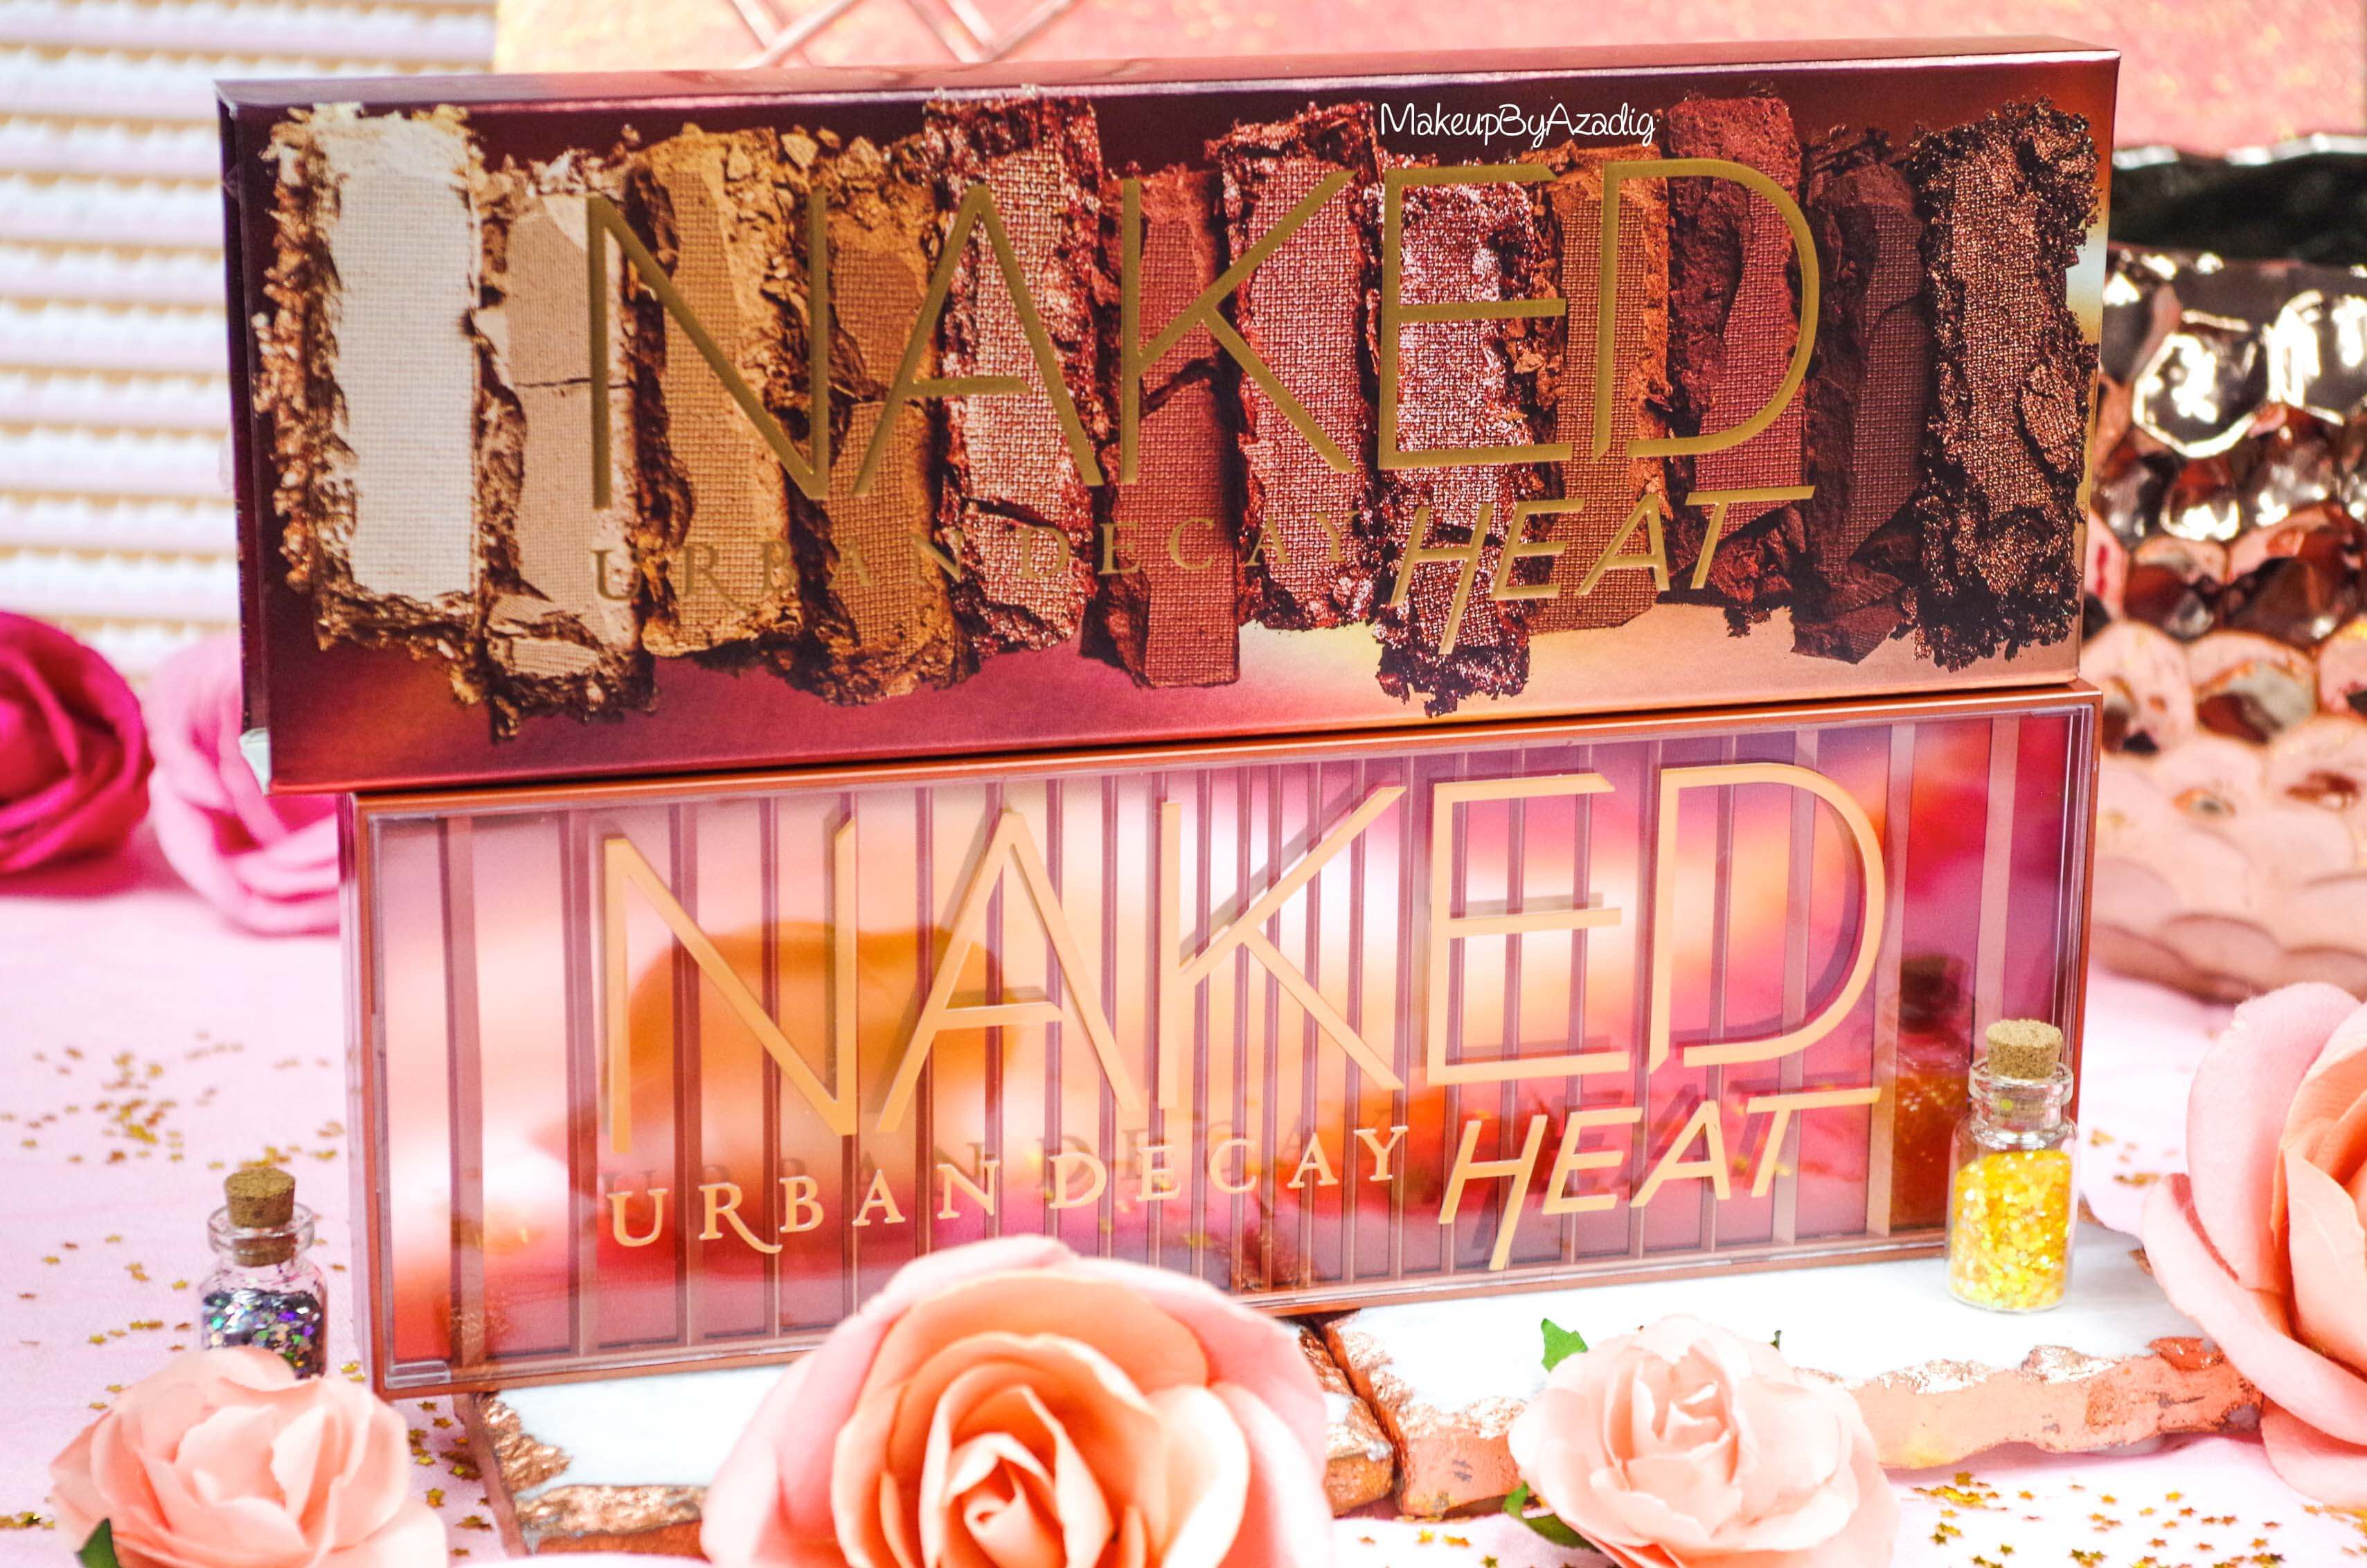 revue-review-nouvelle-palette-naked-heat-urban-decay-sephora-avis-prix-france-makeupbyazadig-swatch-fire